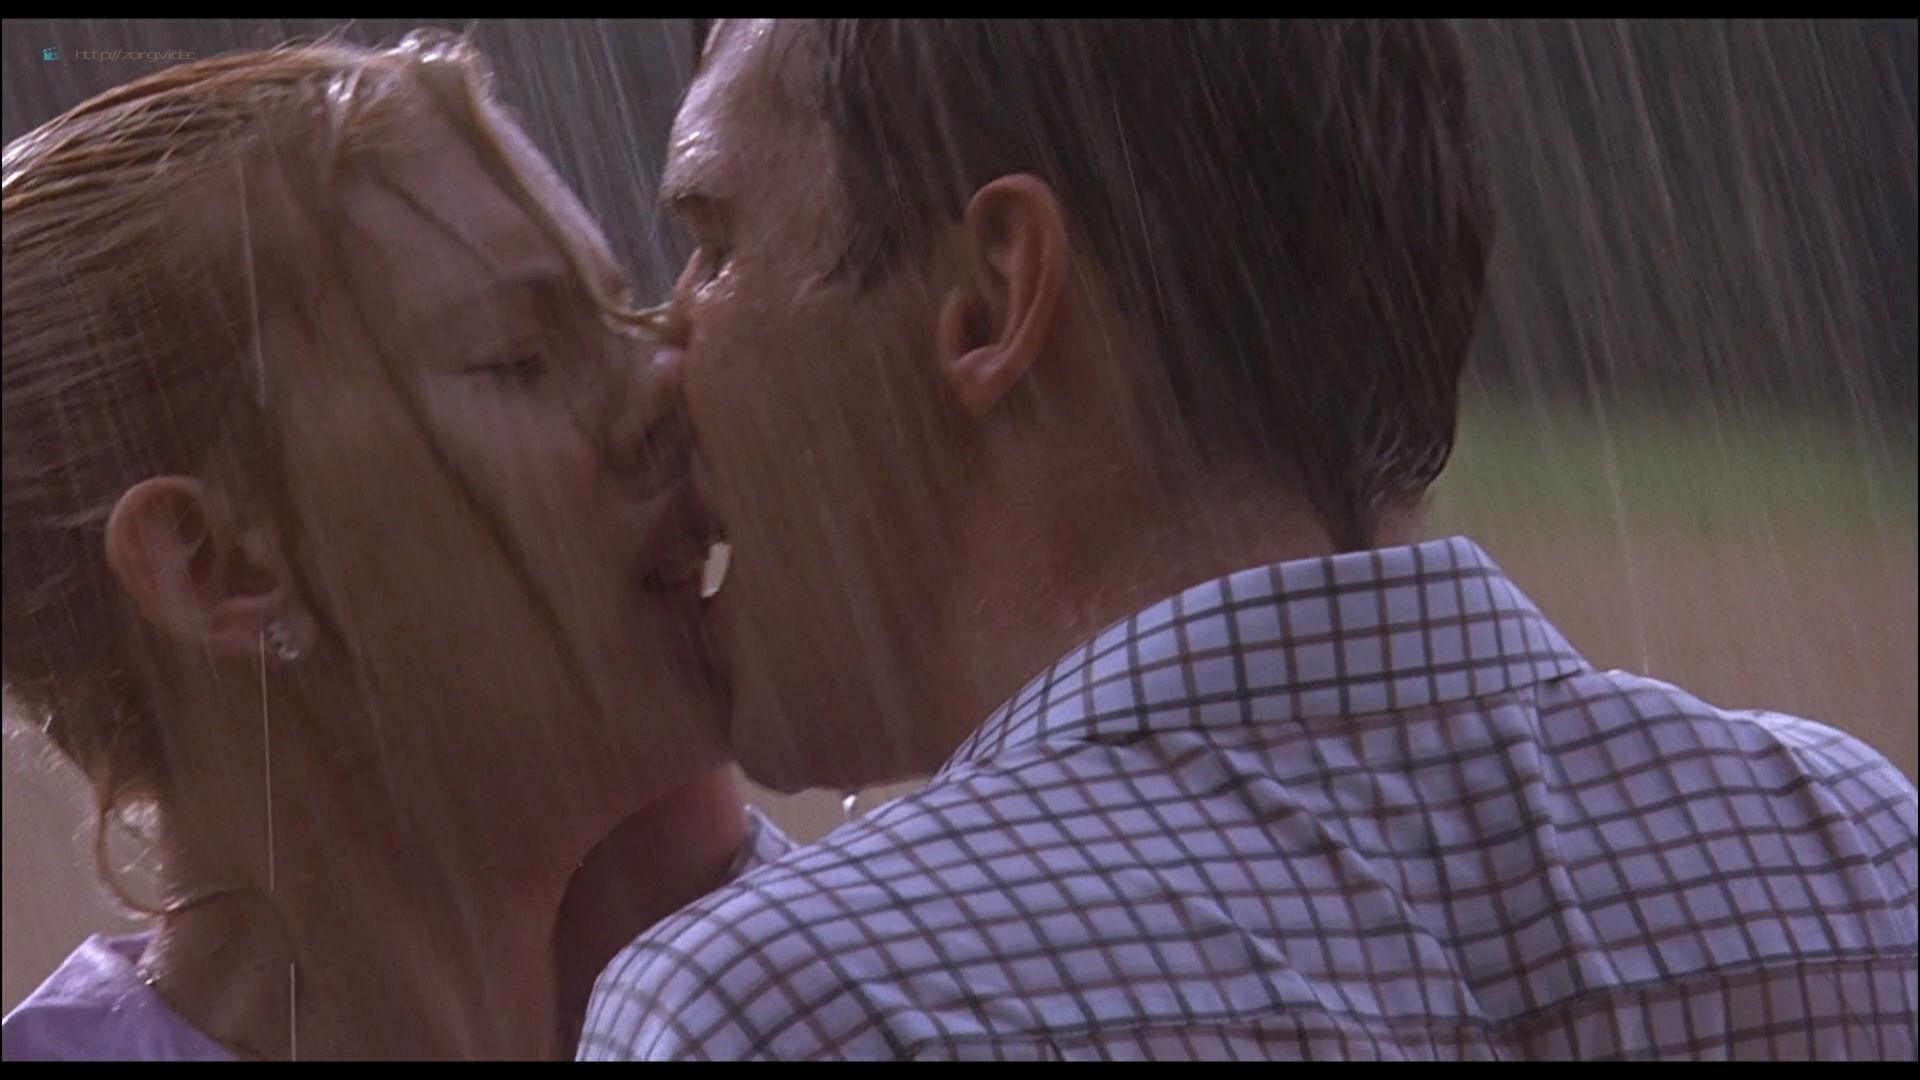 Scarlett Johansson see through and sex - Match Point (2005) HD 1080p BluRay (13)